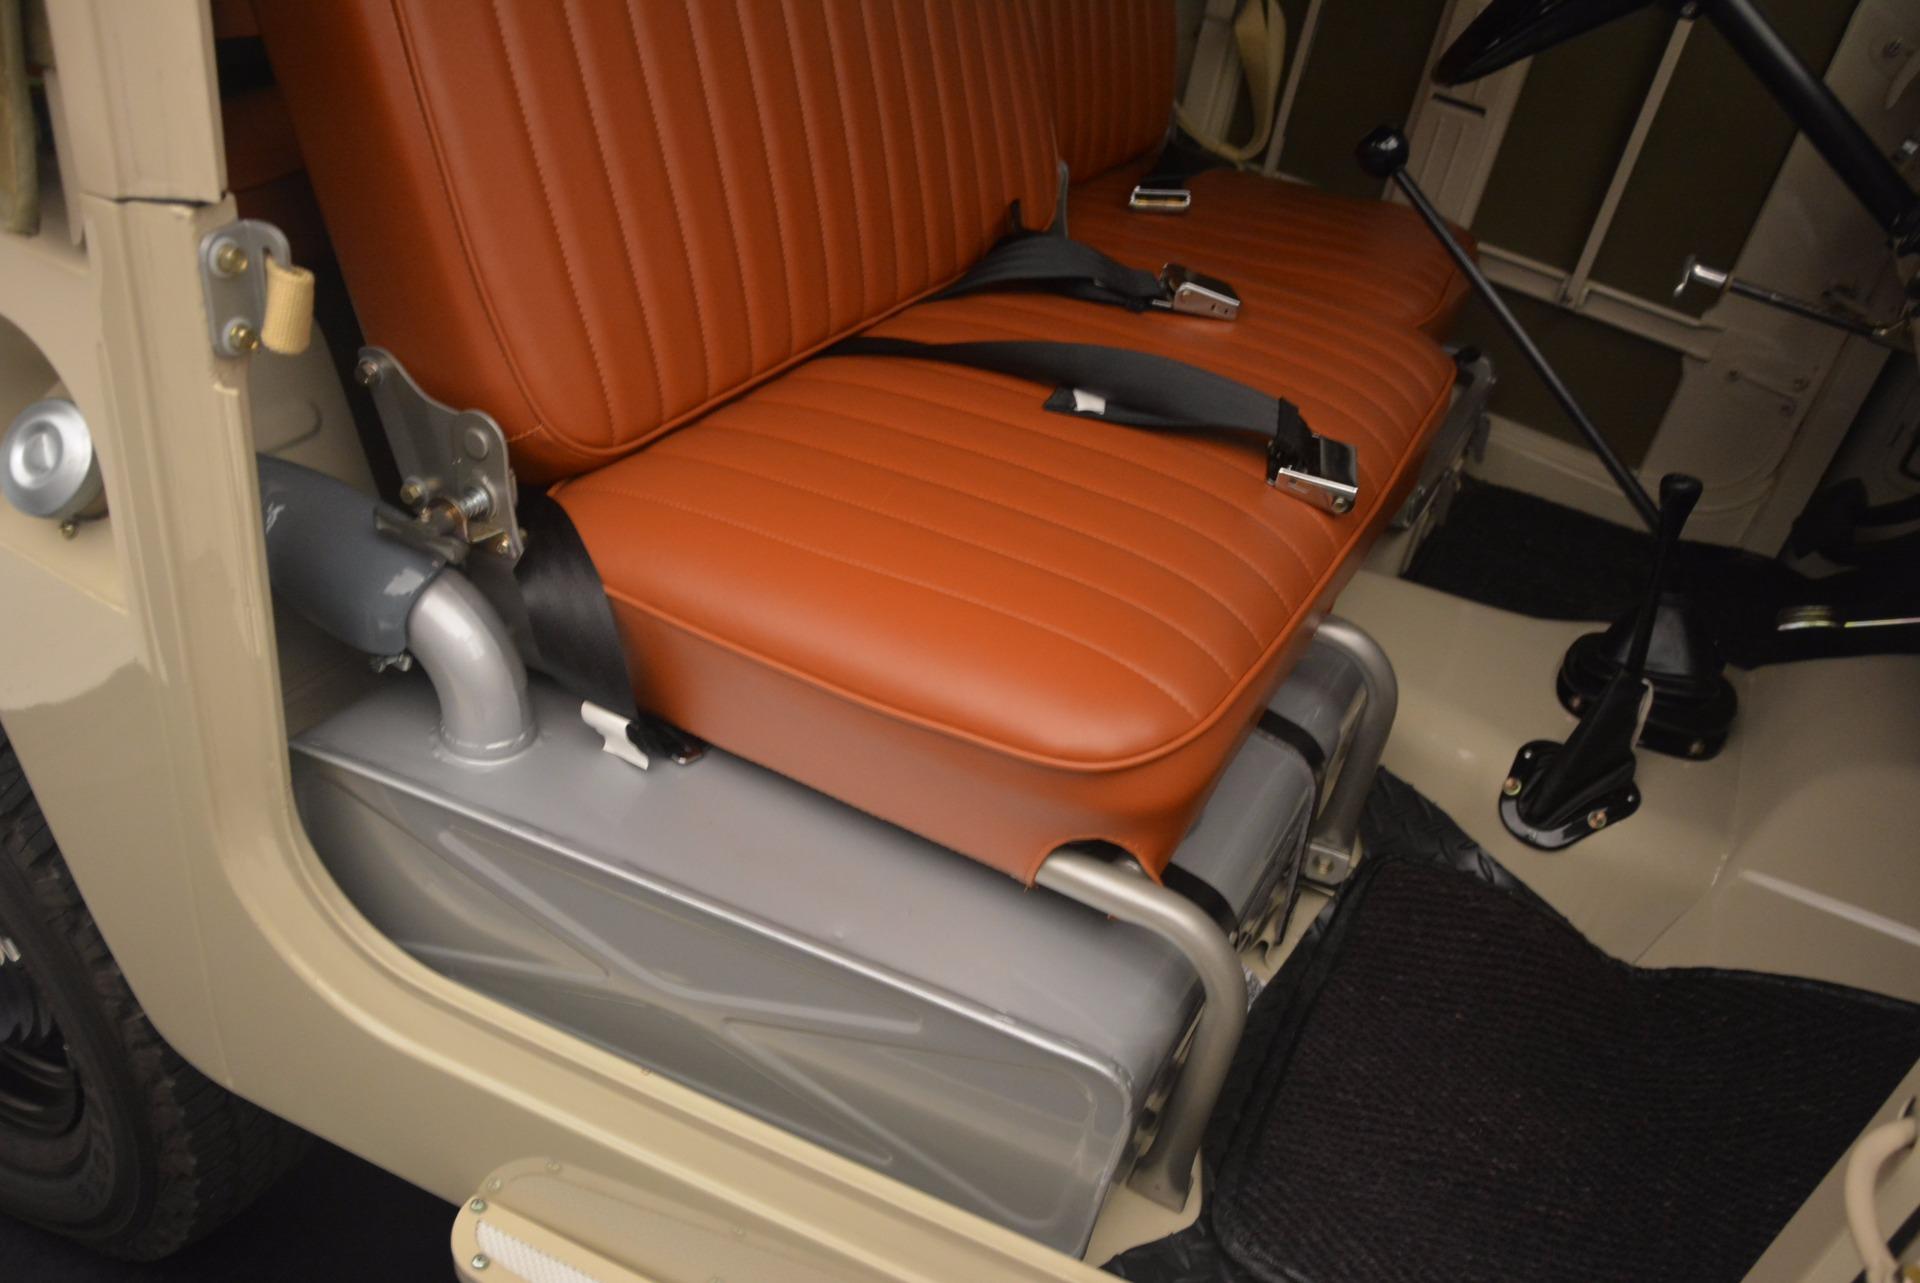 Used-1966-Toyota-FJ40-Land-Cruiser-Land-Cruiser